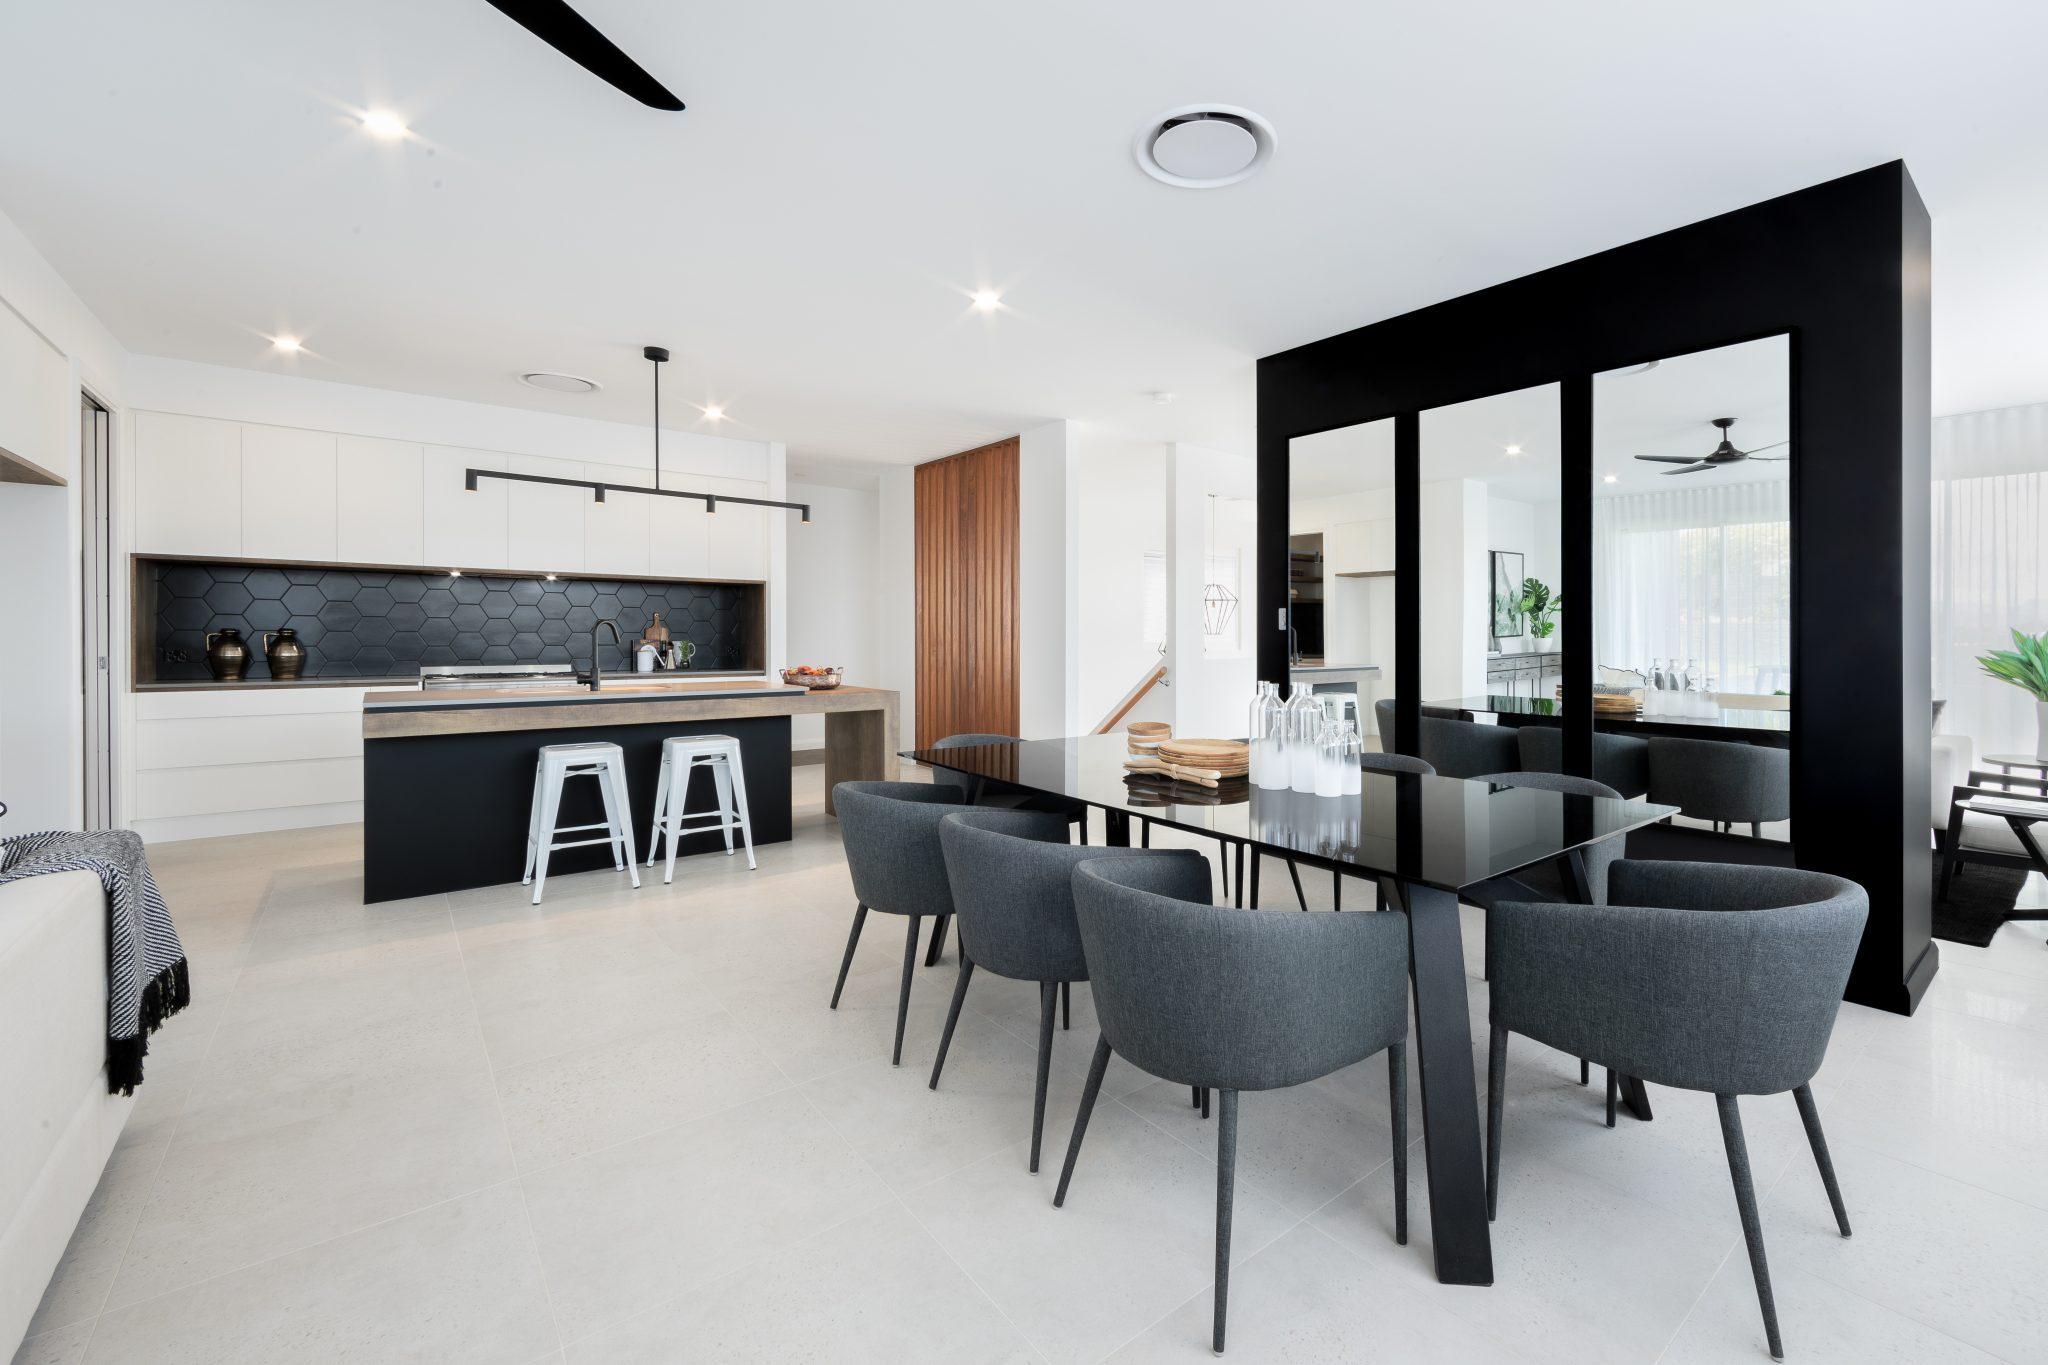 Kitchens Gold Coast 2019